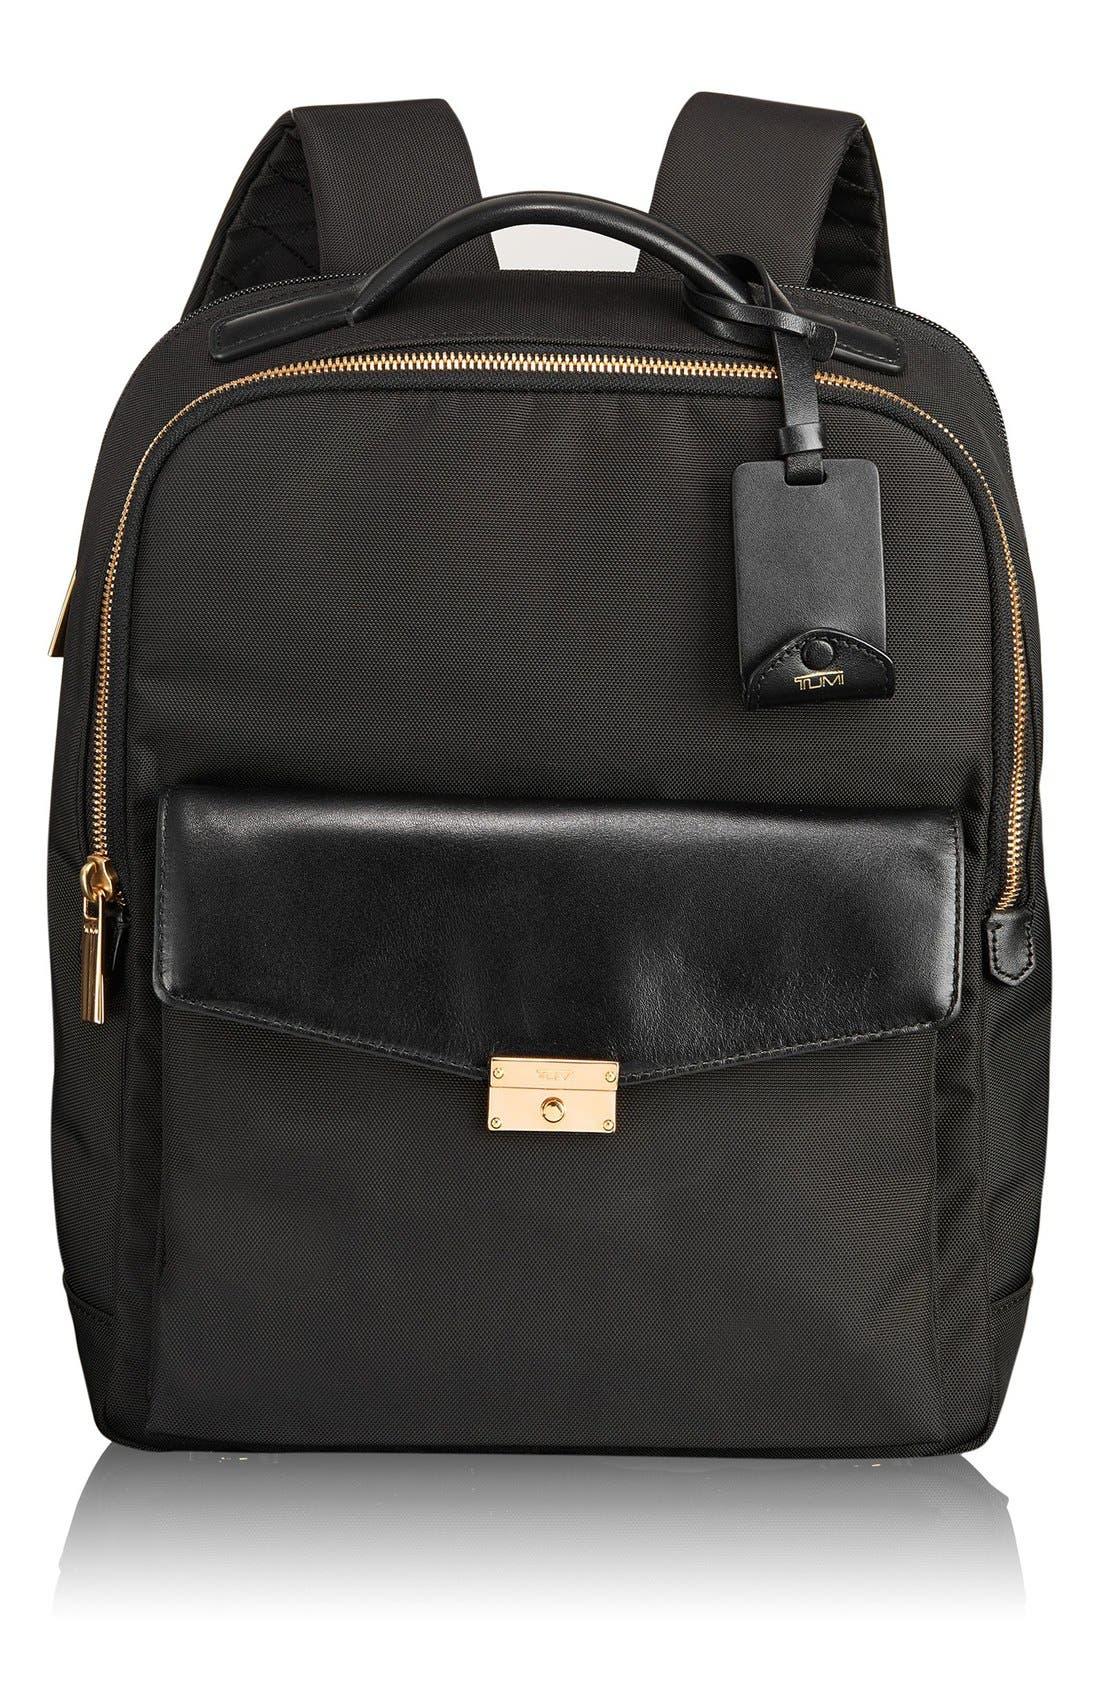 'Larkin Laurel' Nylon Commuter Backpack, Main, color, 001